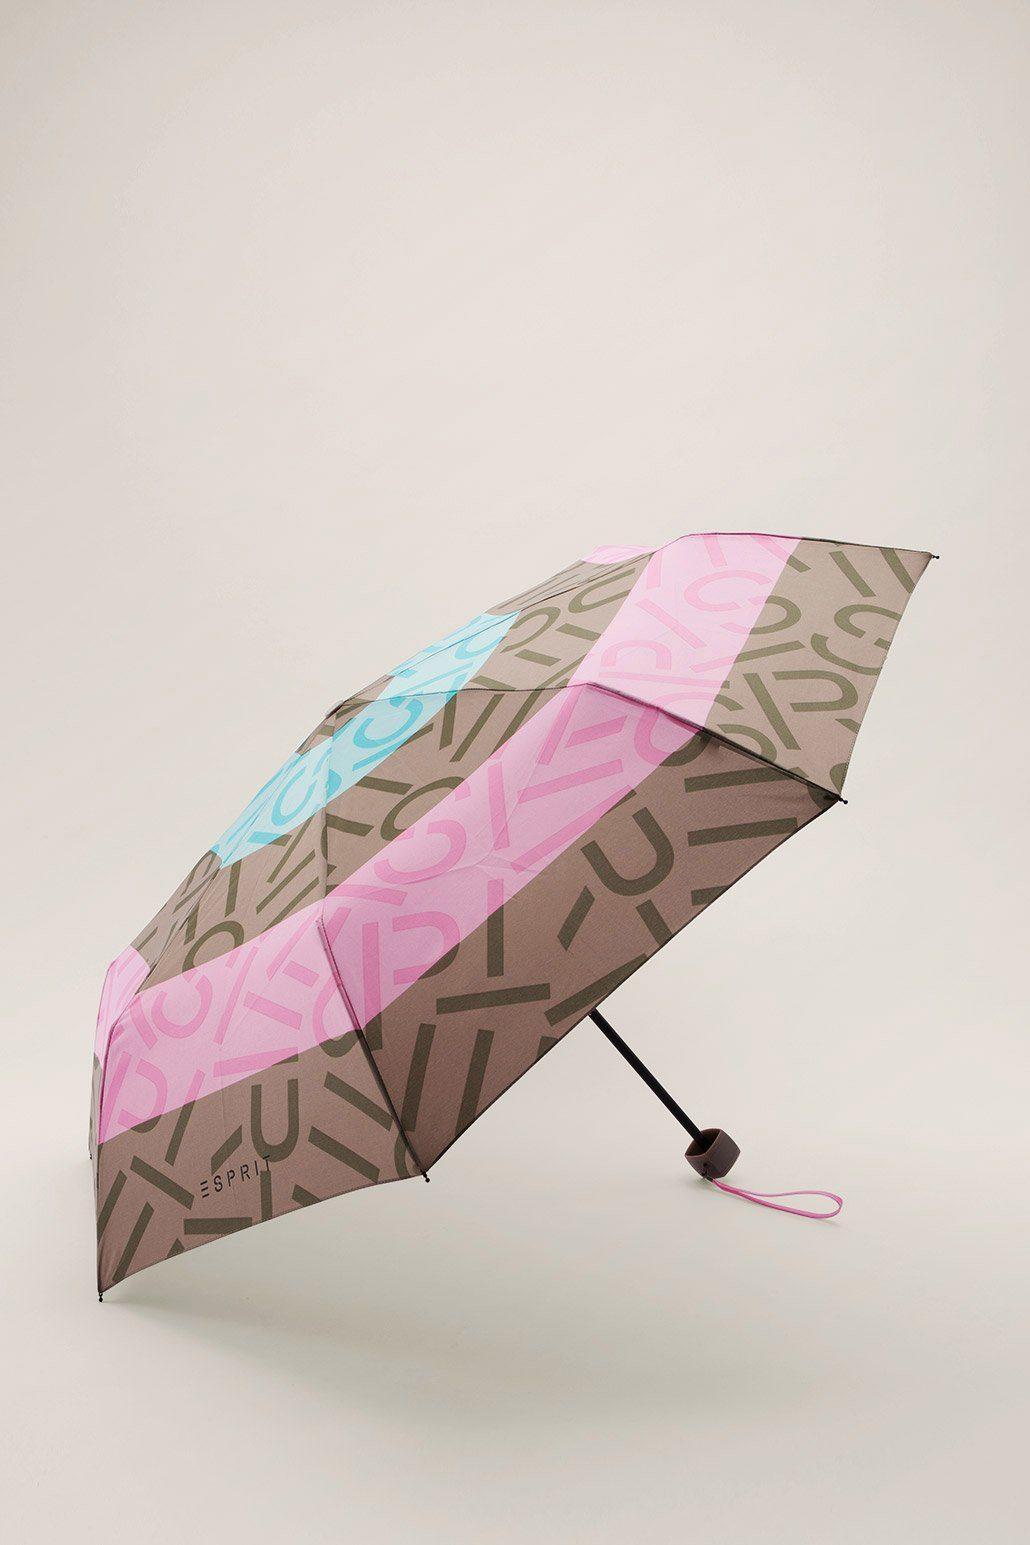 ESPRIT CASUAL 2 in 1: Regenschirm mit Tasche